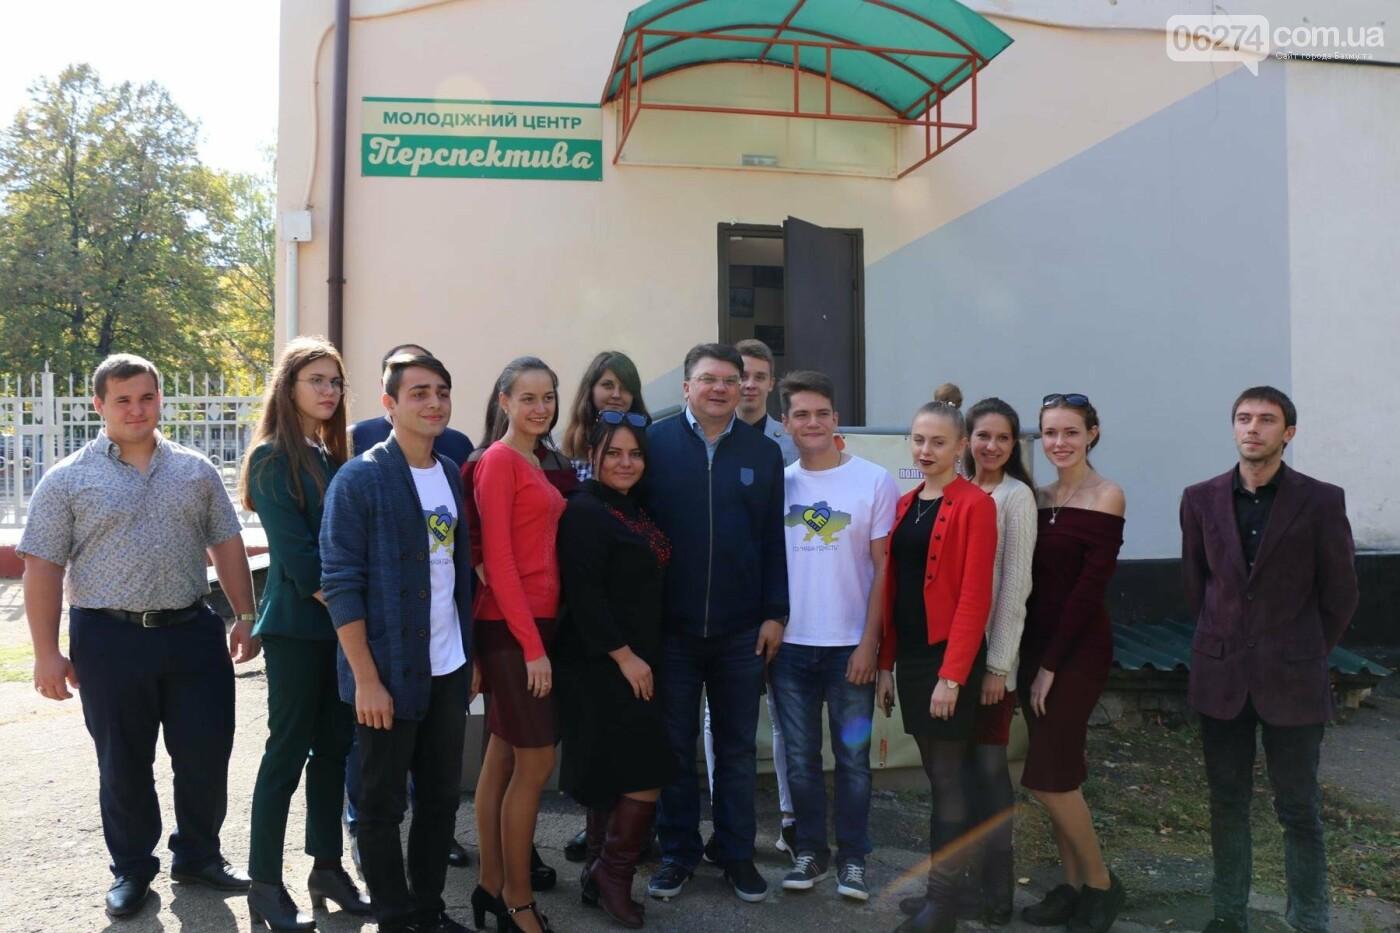 Бахмут посетил министр молодежи и спорта Украины, фото-8